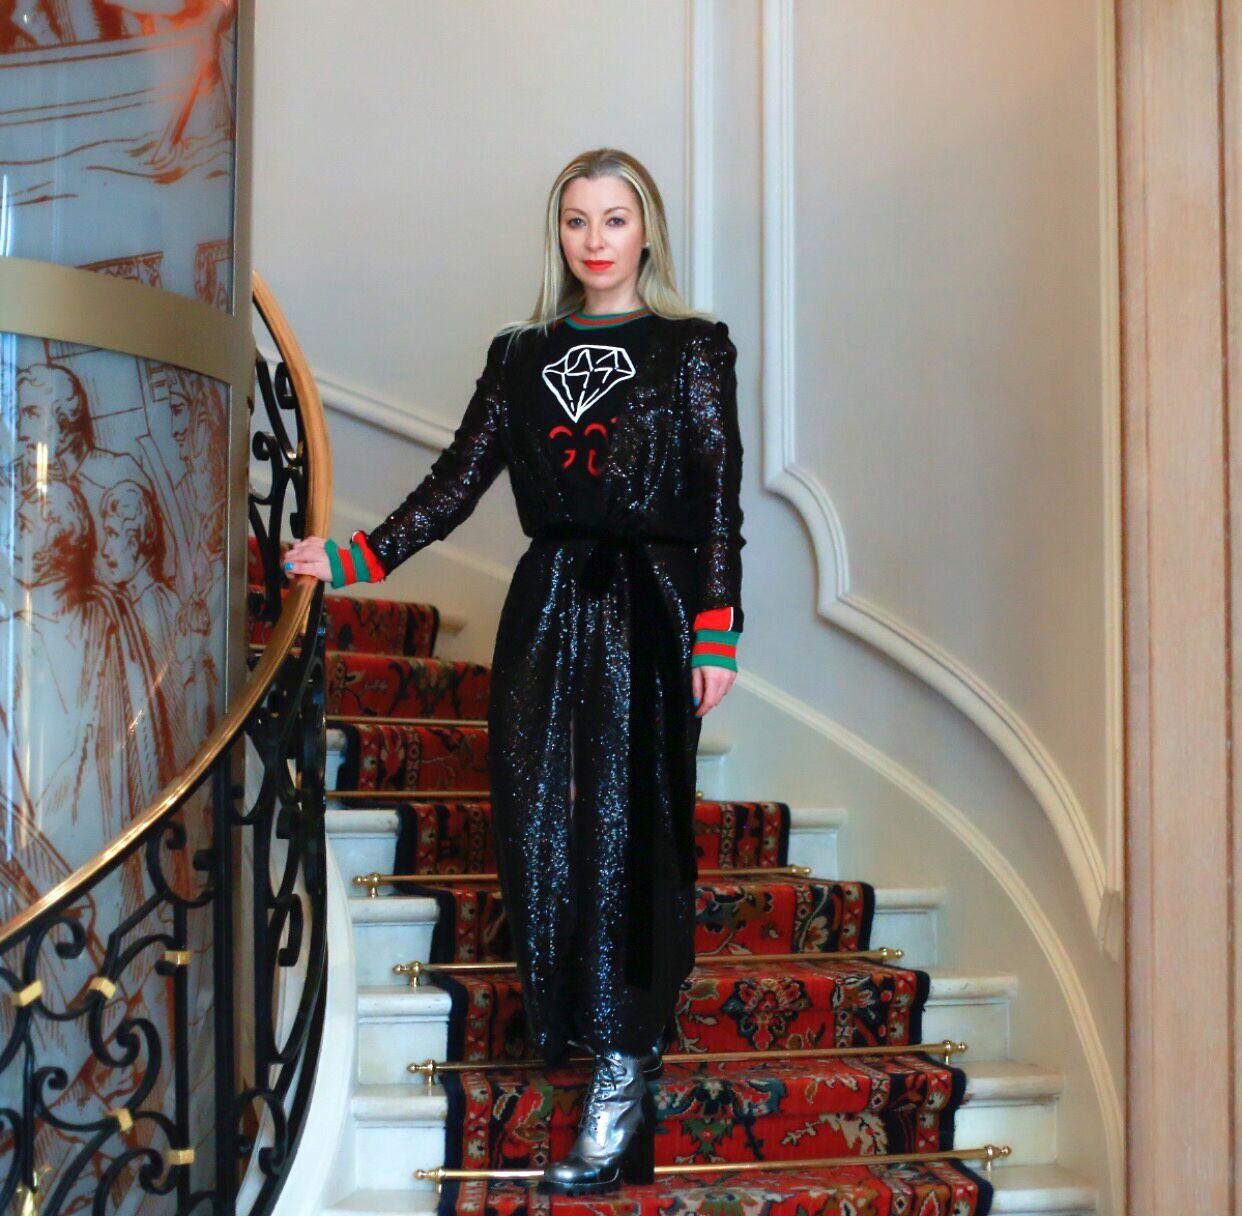 c7d0bedc56bf I Will Miss Paris—Sonya Molodetskaya s Paris Fashion Week Diary